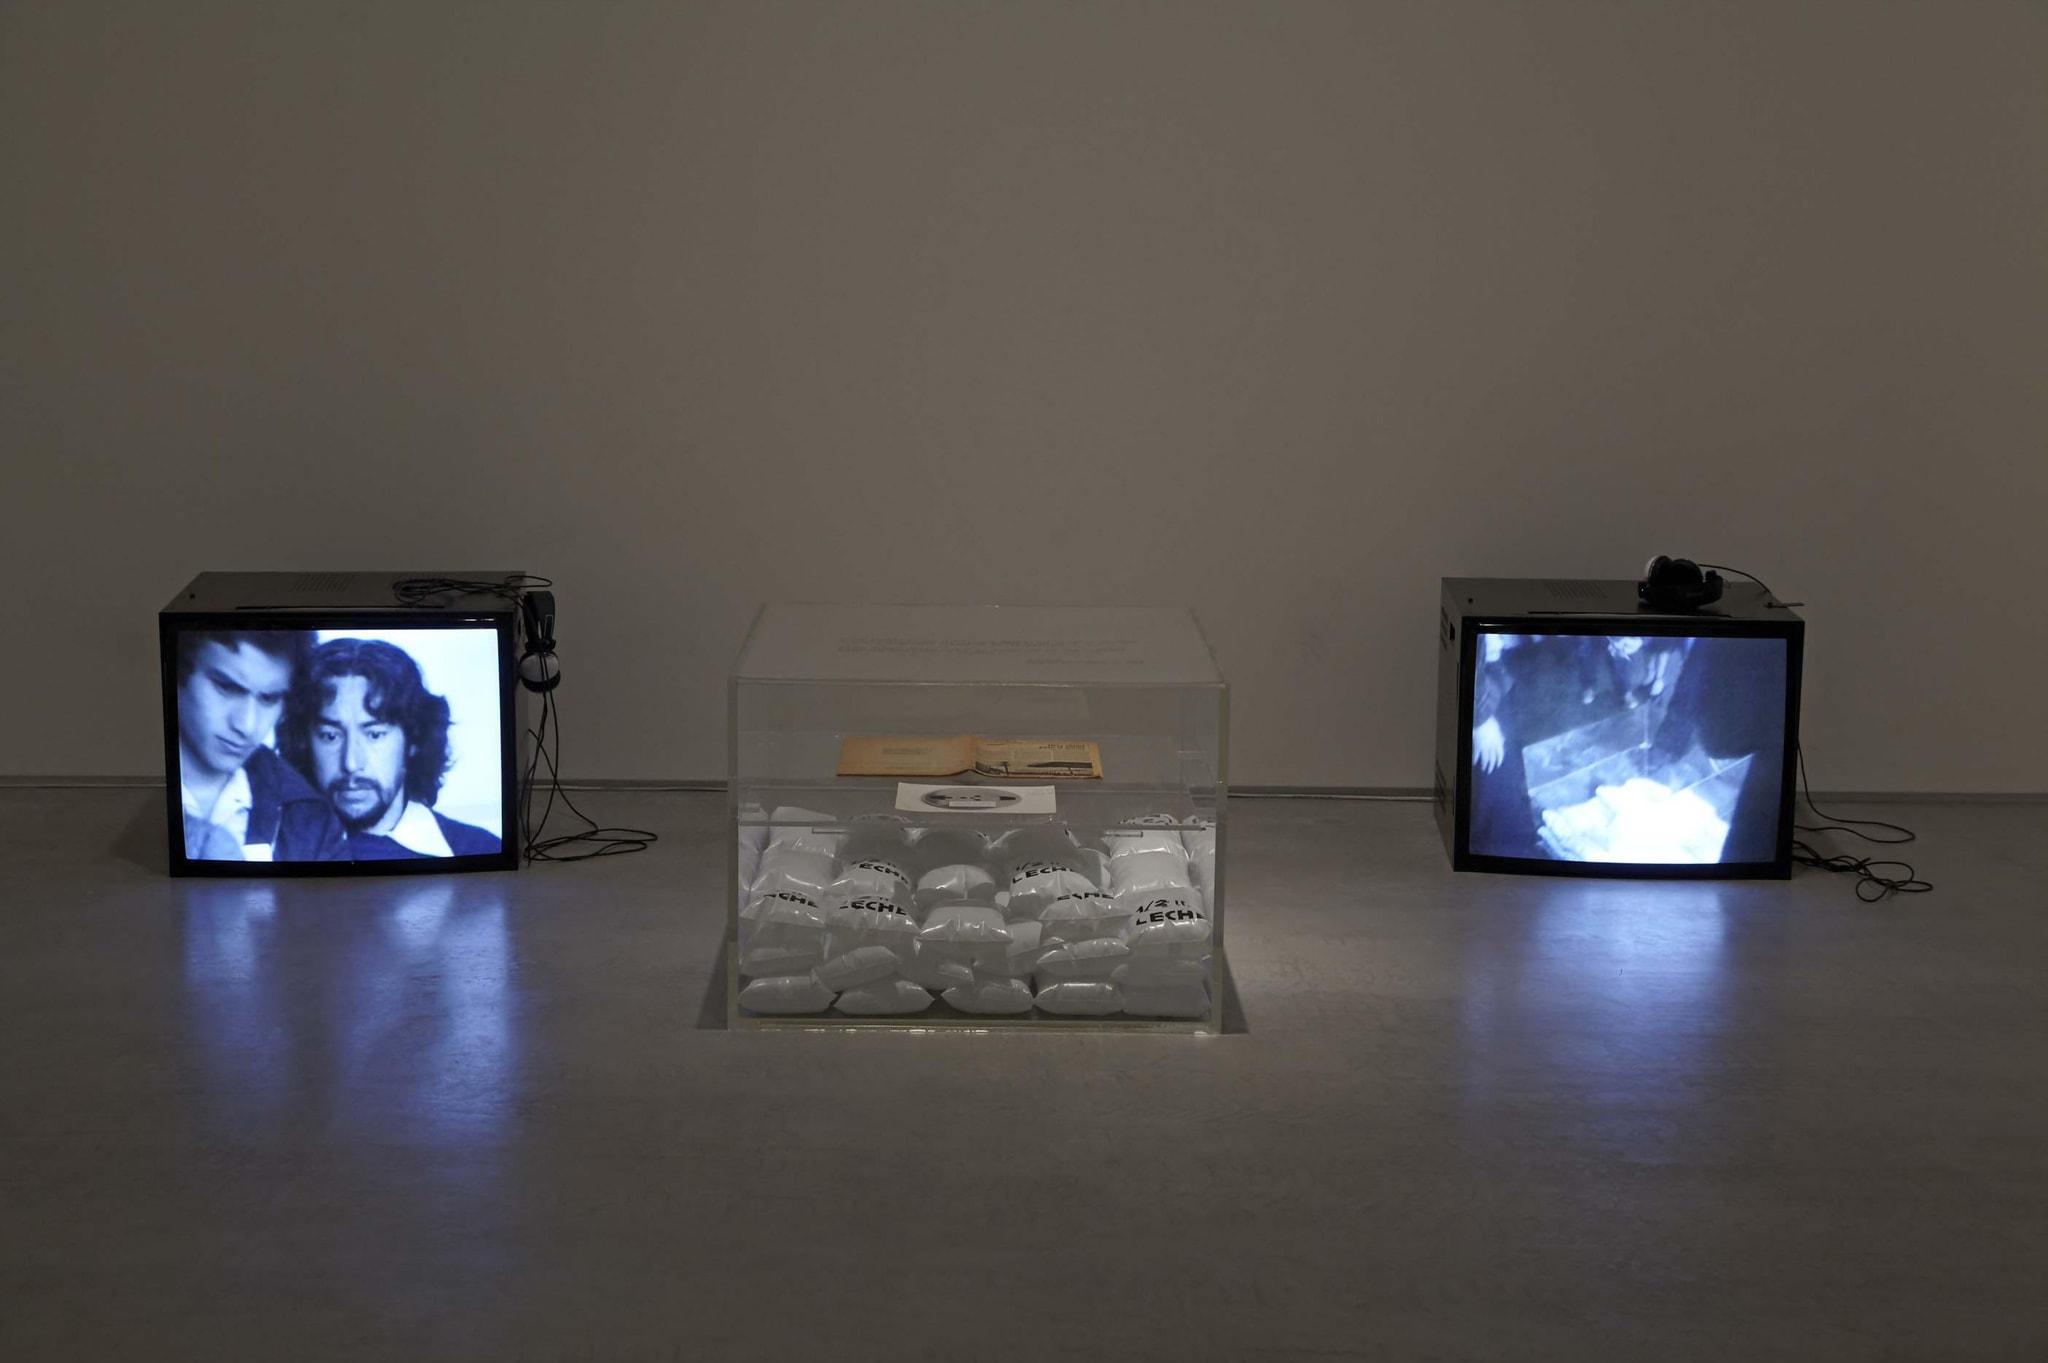 Para no morir de hambre en el arte / Not to die of hunger in art by Lotty Rosenfeld + CADA (Art Actions Collective)